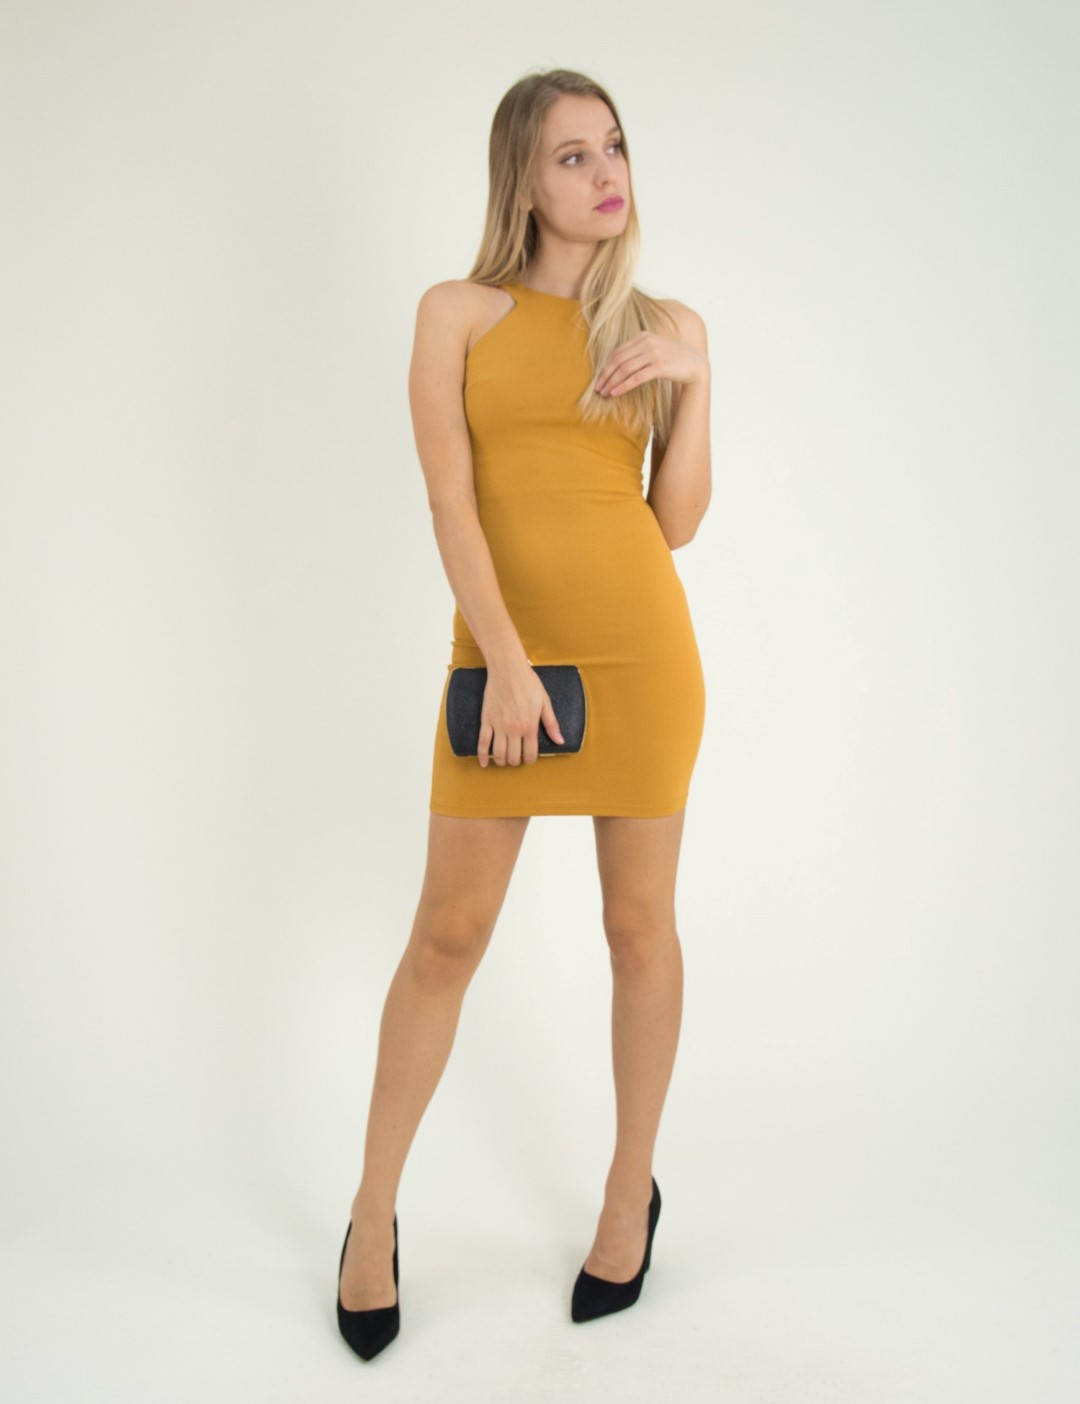 3ce248433841 Torouxo Γυναικείο ώχρα ελαστικό φόρεμα Cocktail 014100001G